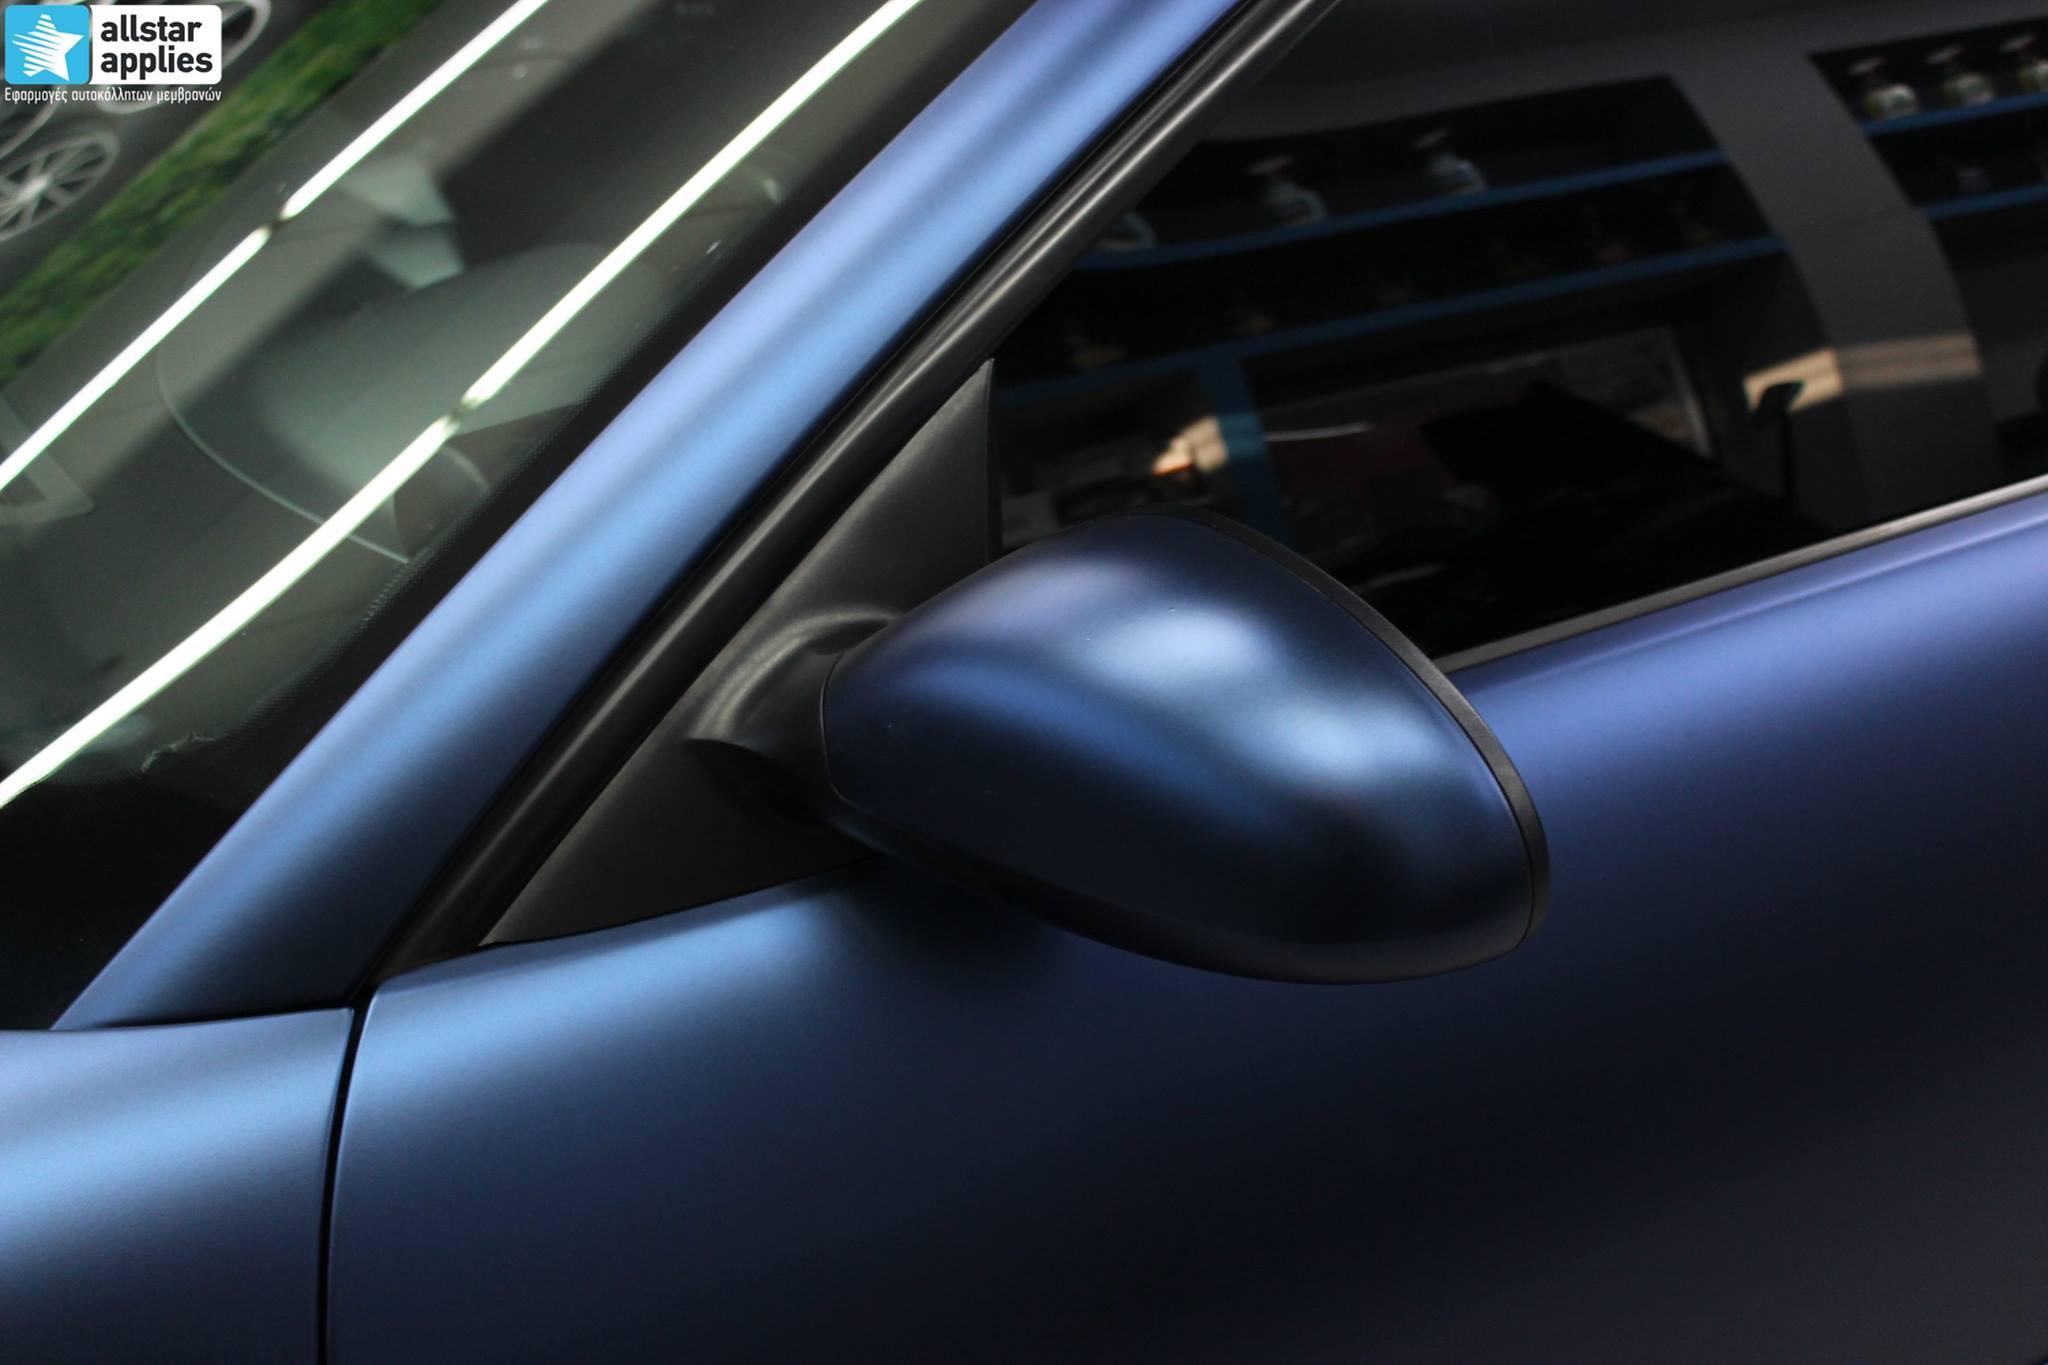 Seat Ibiza - Matte Trenton Blue (12)